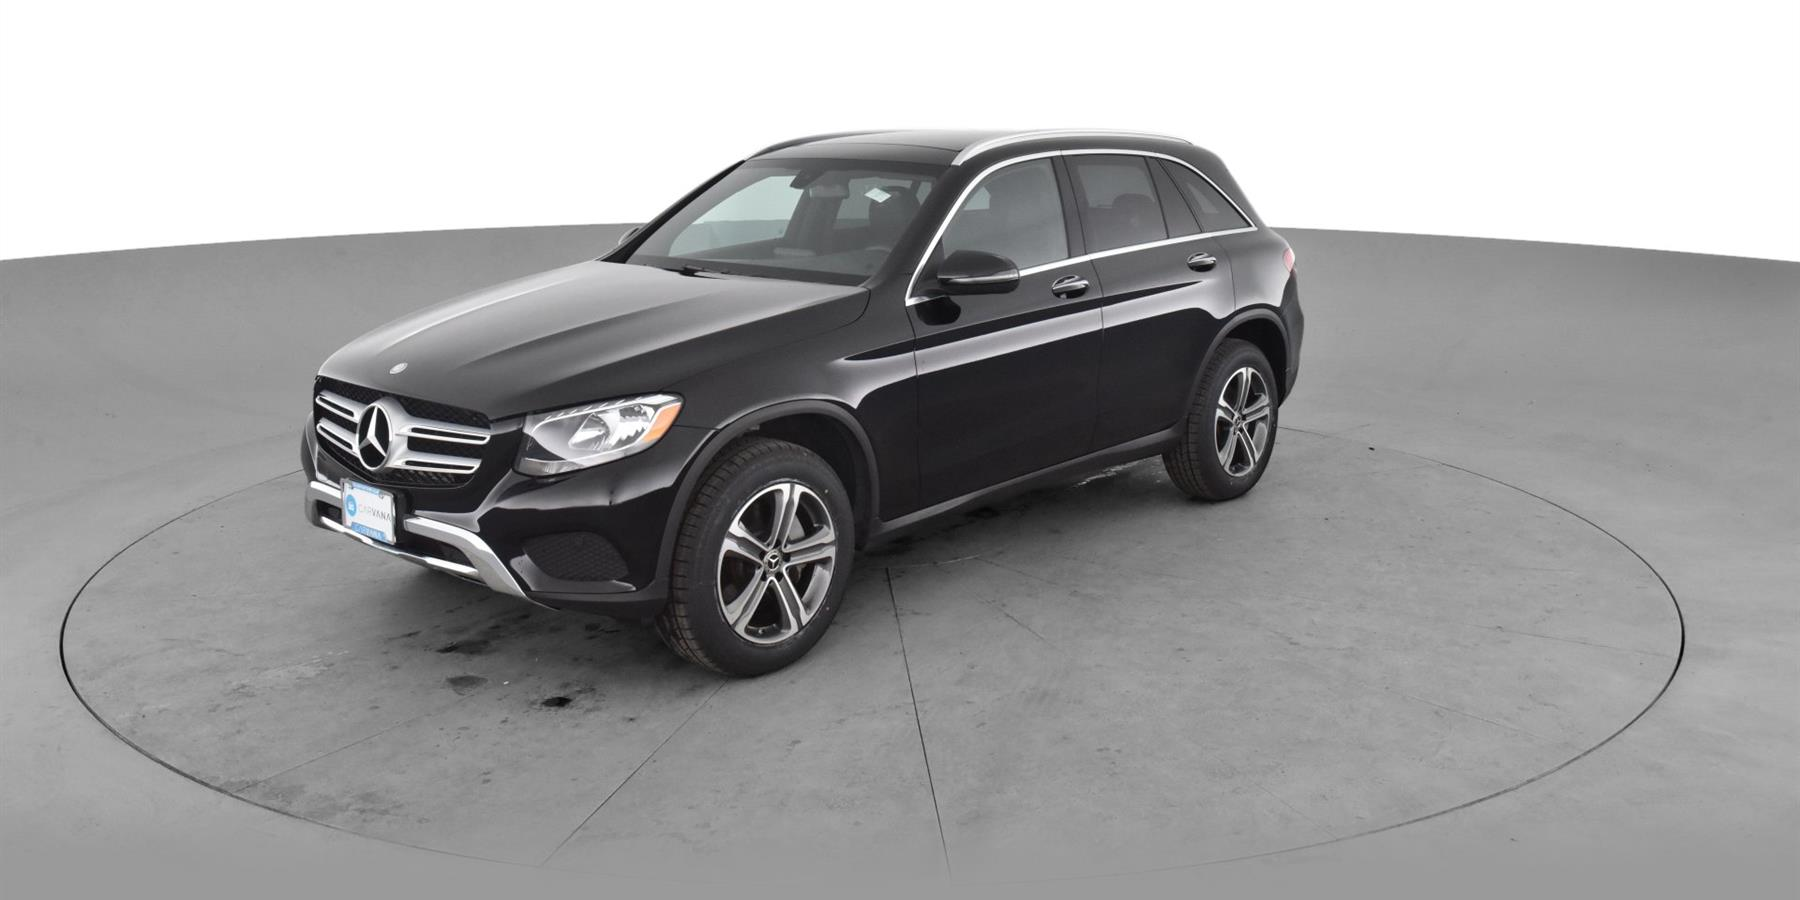 2017 Mercedes-Benz GLC GLC 300 4MATIC Sport Utility 4D for Sale